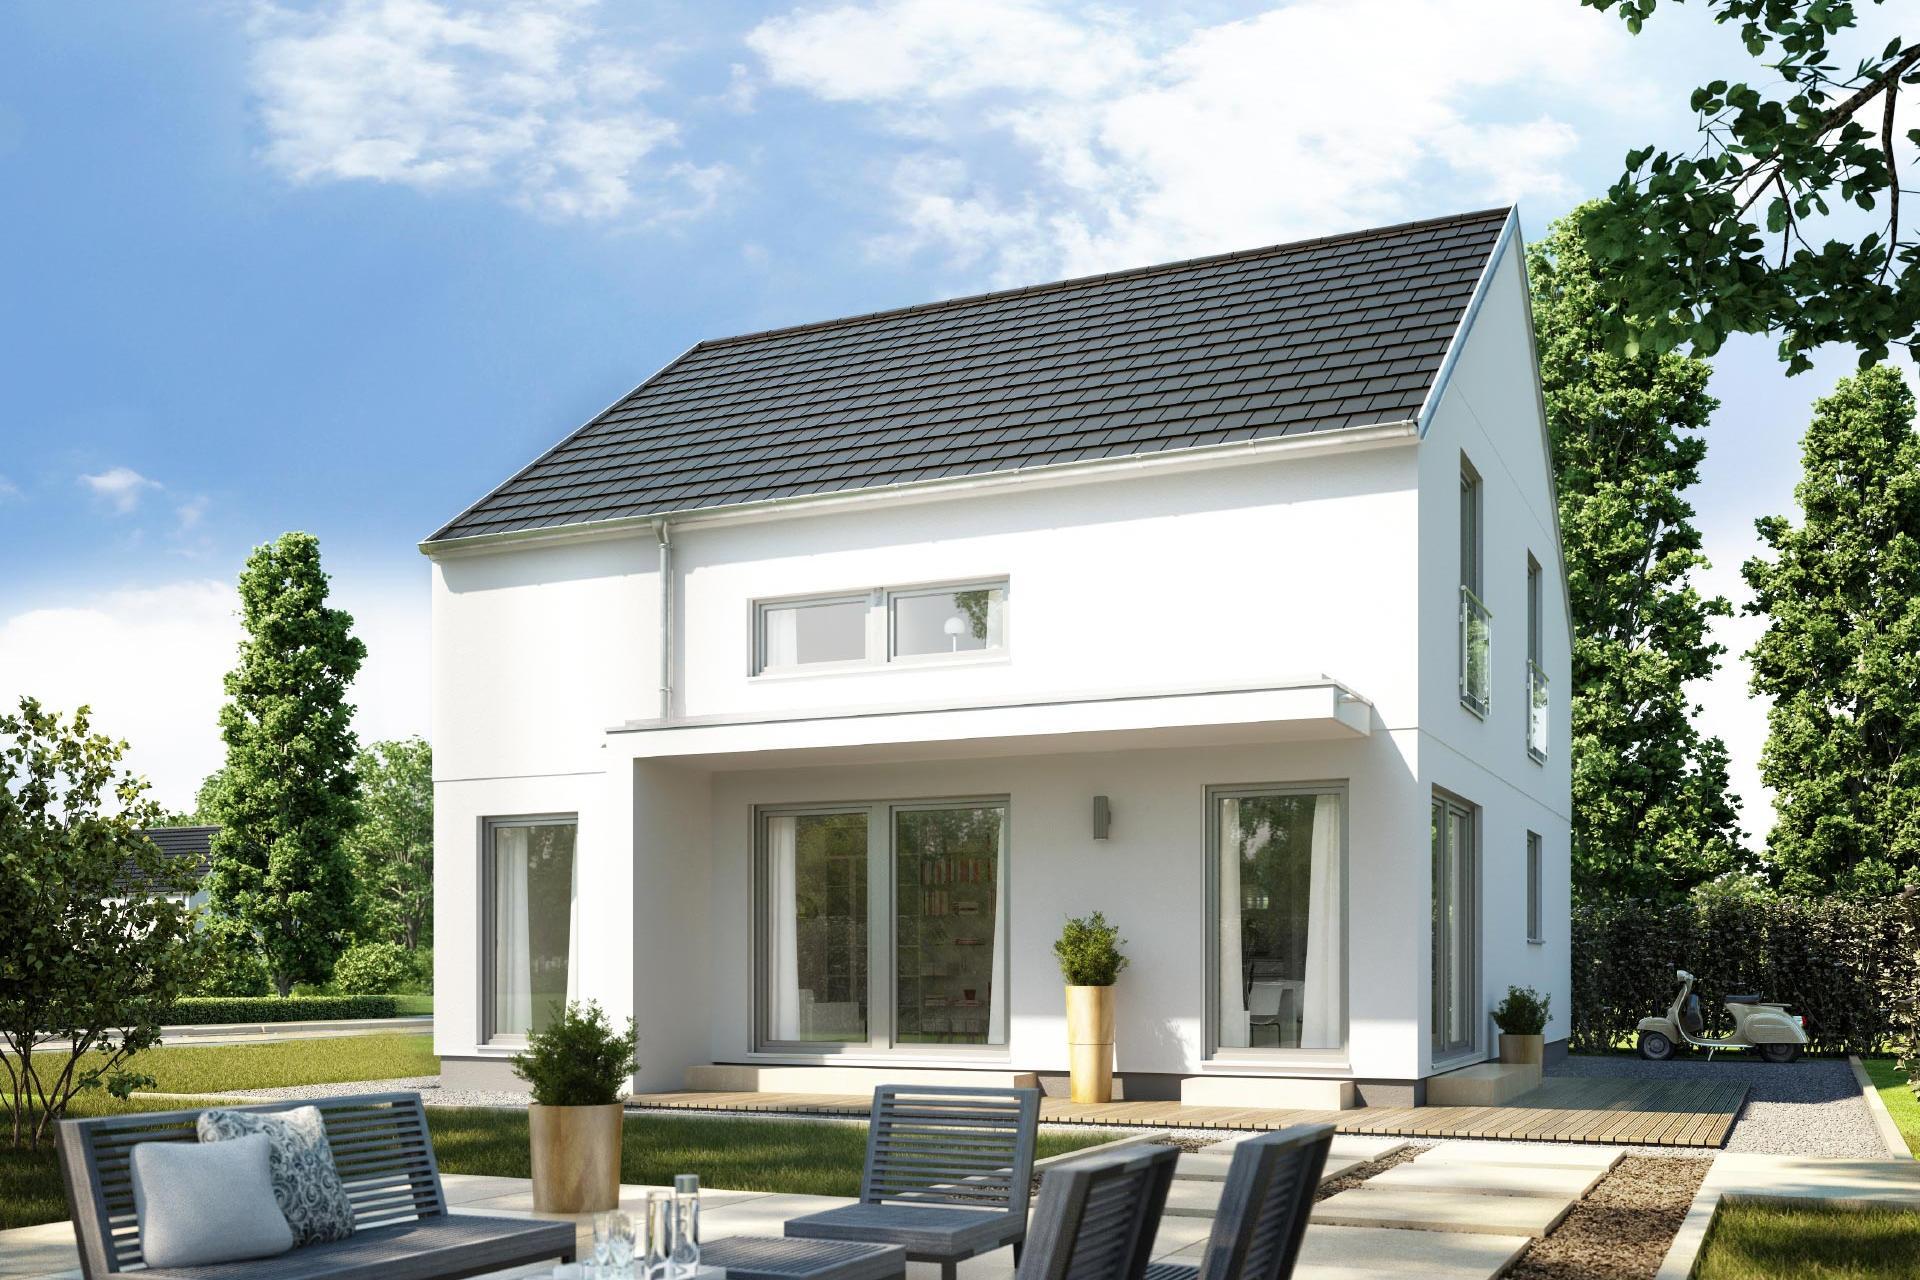 Maison Avec Terrasse Couverte   E 15-149.8   Schwörerhaus concernant Maison Avec Terrasse Couverte